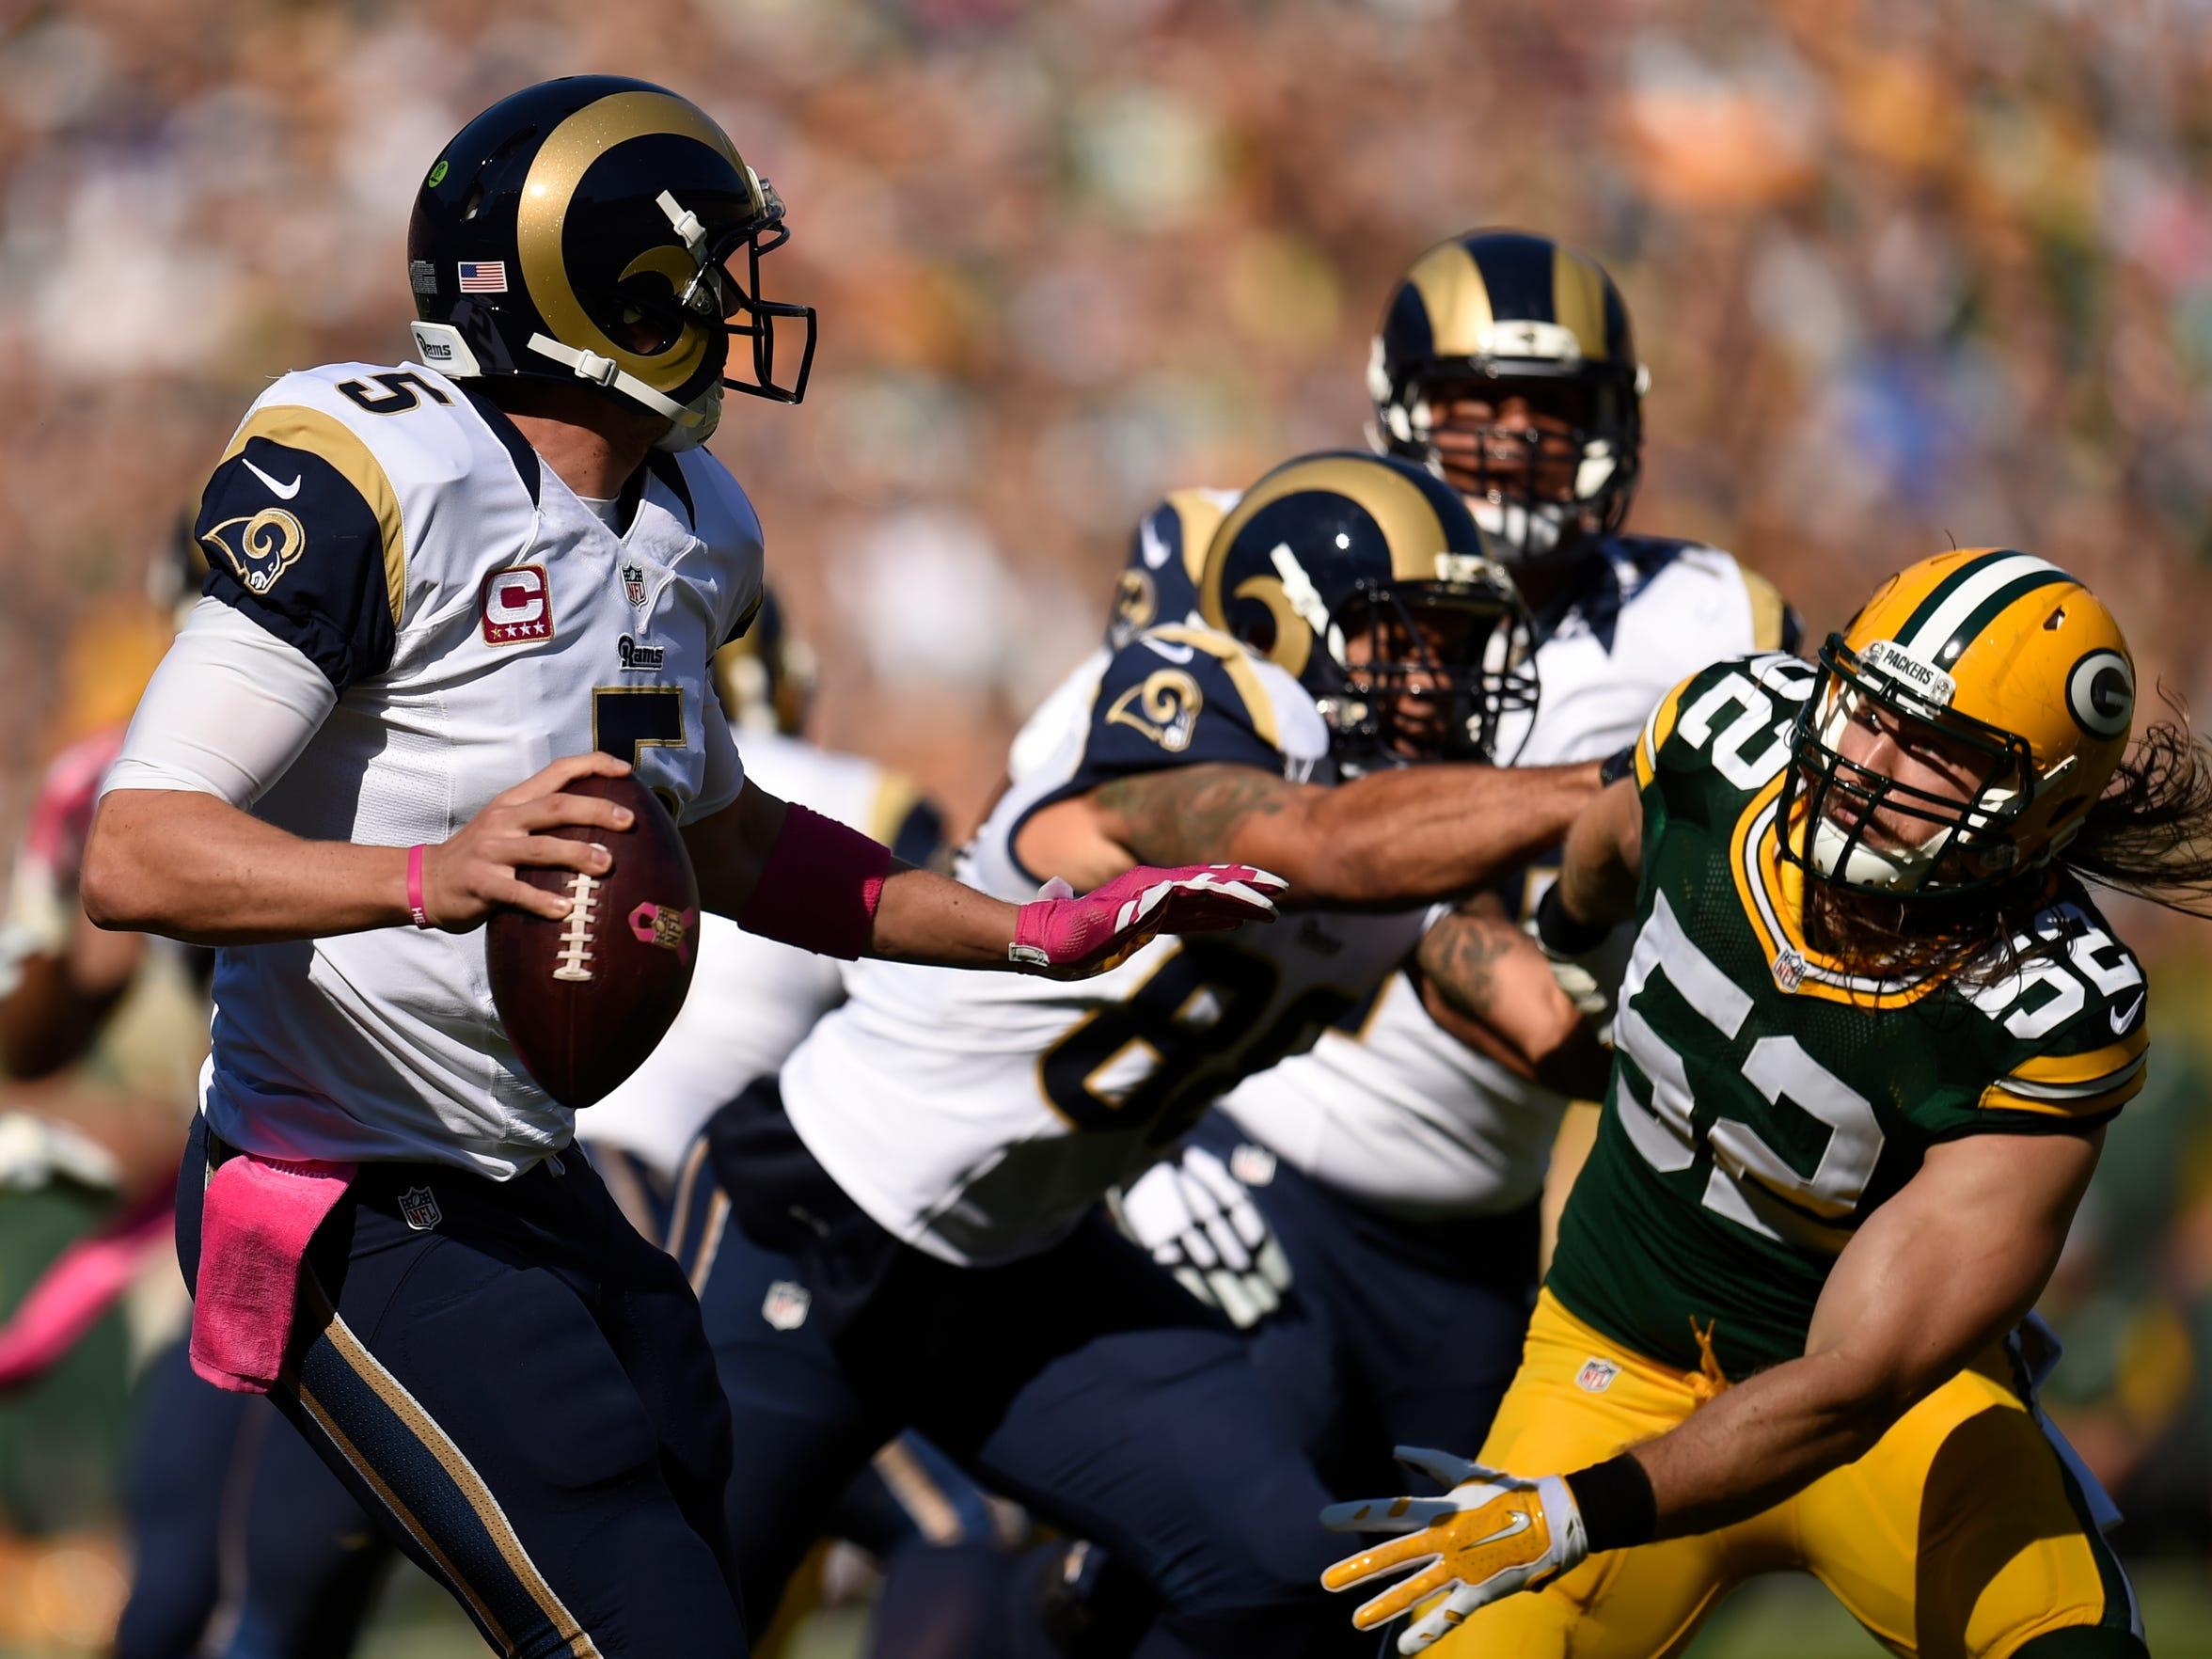 St. Louis Rams quarterback Nick Foles is pressured by Green Bay Packers inside linebacker Clay Matthews (52) at Lambeau Field.